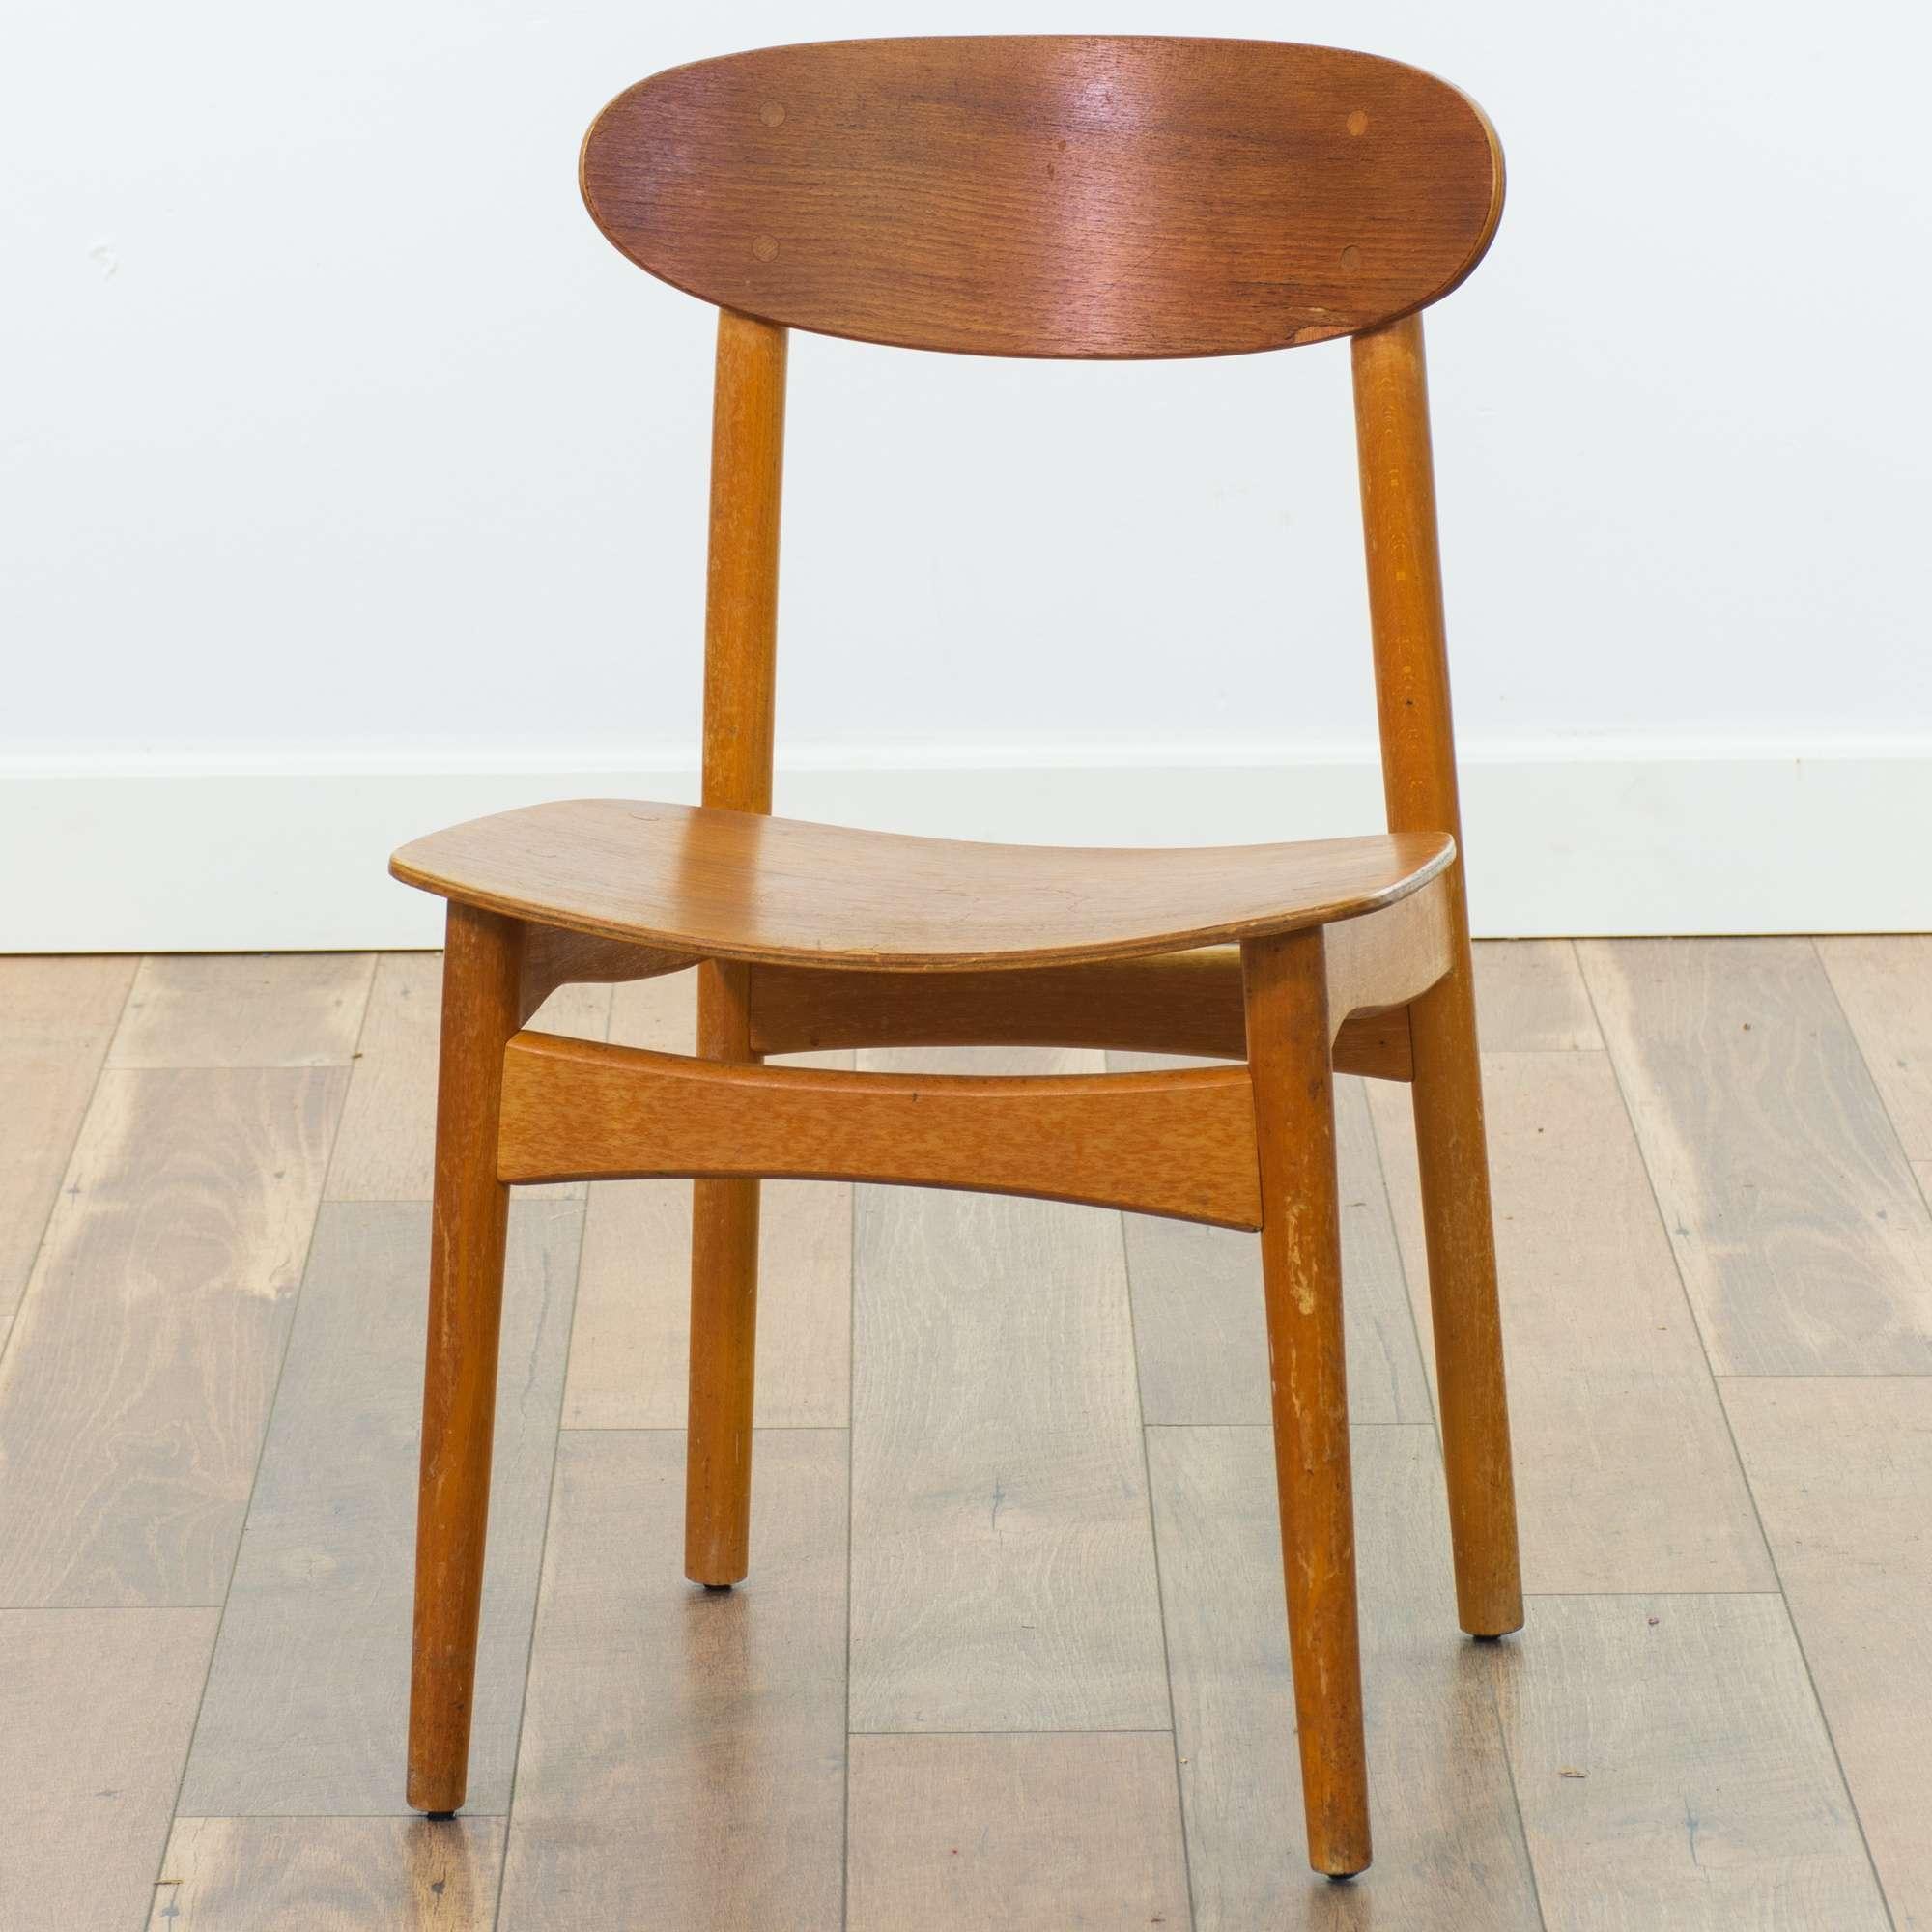 Superb Danish Modern Curved Back Dining Chair Loveseat Vintage Machost Co Dining Chair Design Ideas Machostcouk